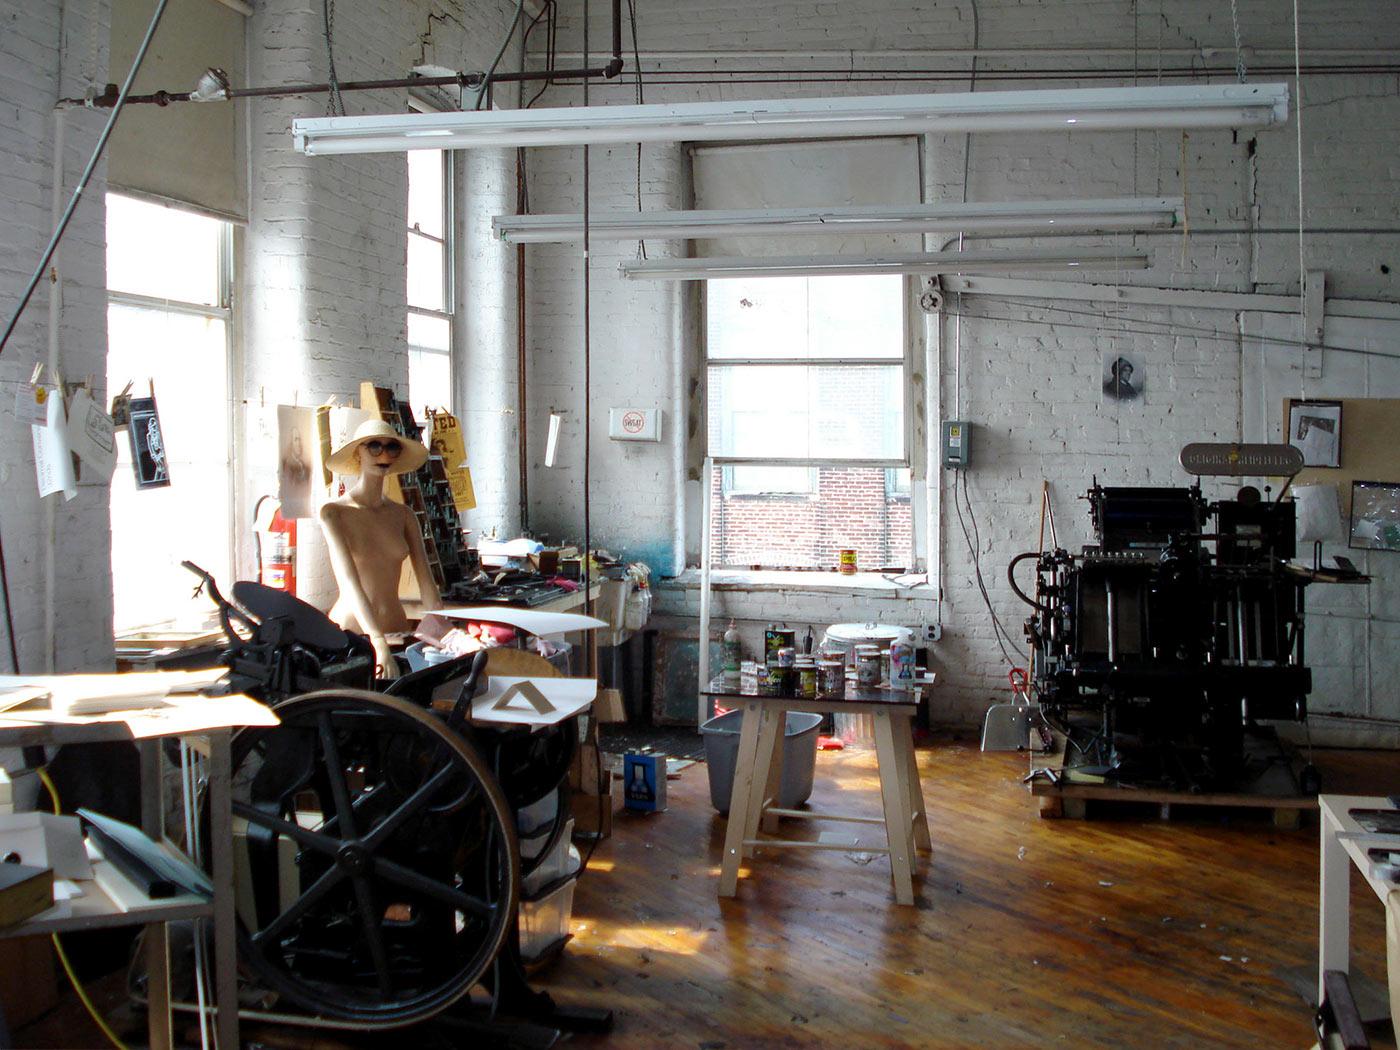 Our letterpress studio in the Port Richmond neighborhood of Philadelphia, PA.